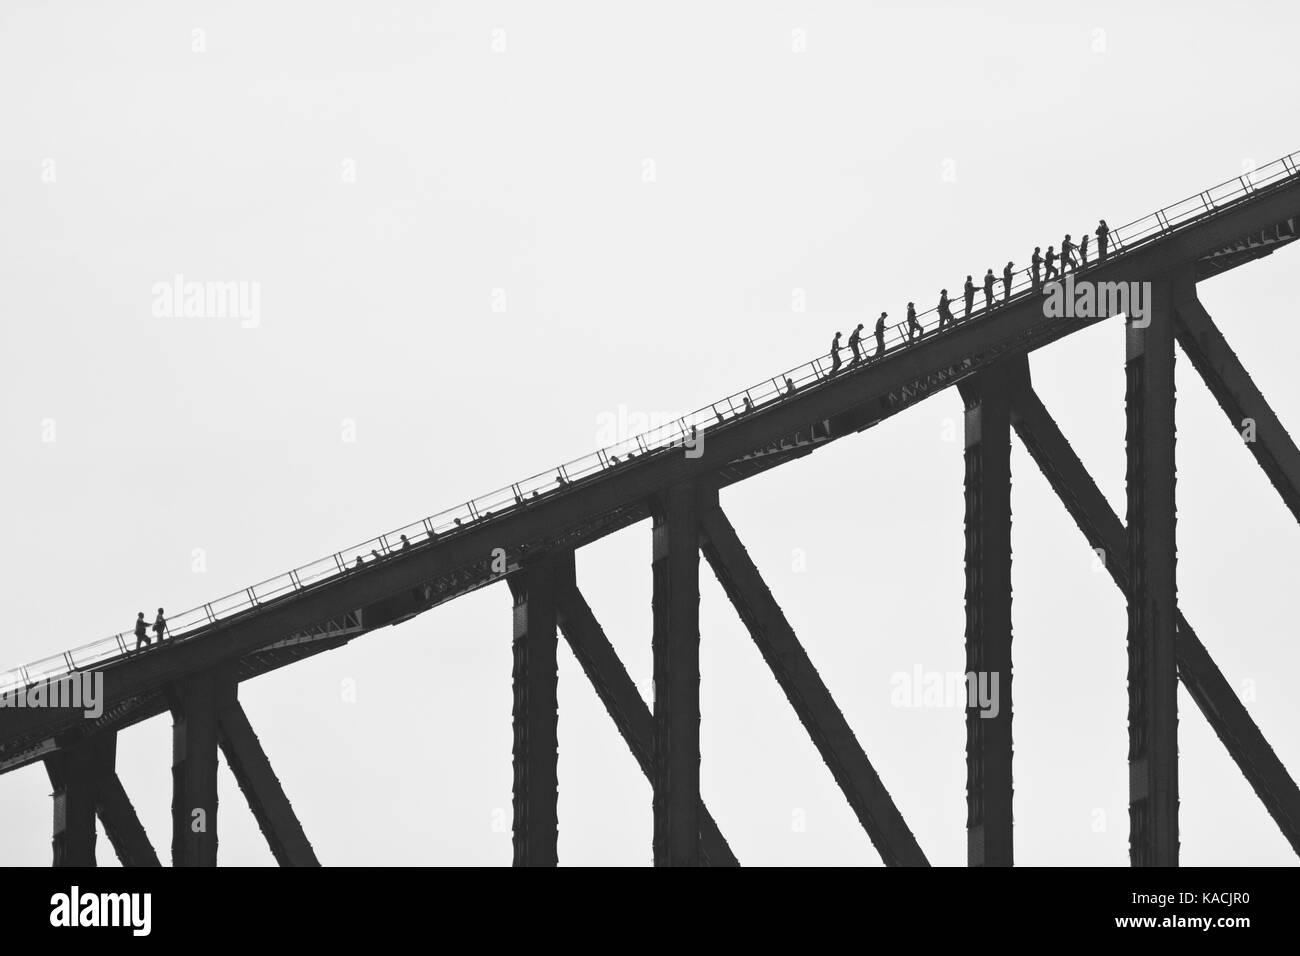 People on Harbour Bridge - Stock Image